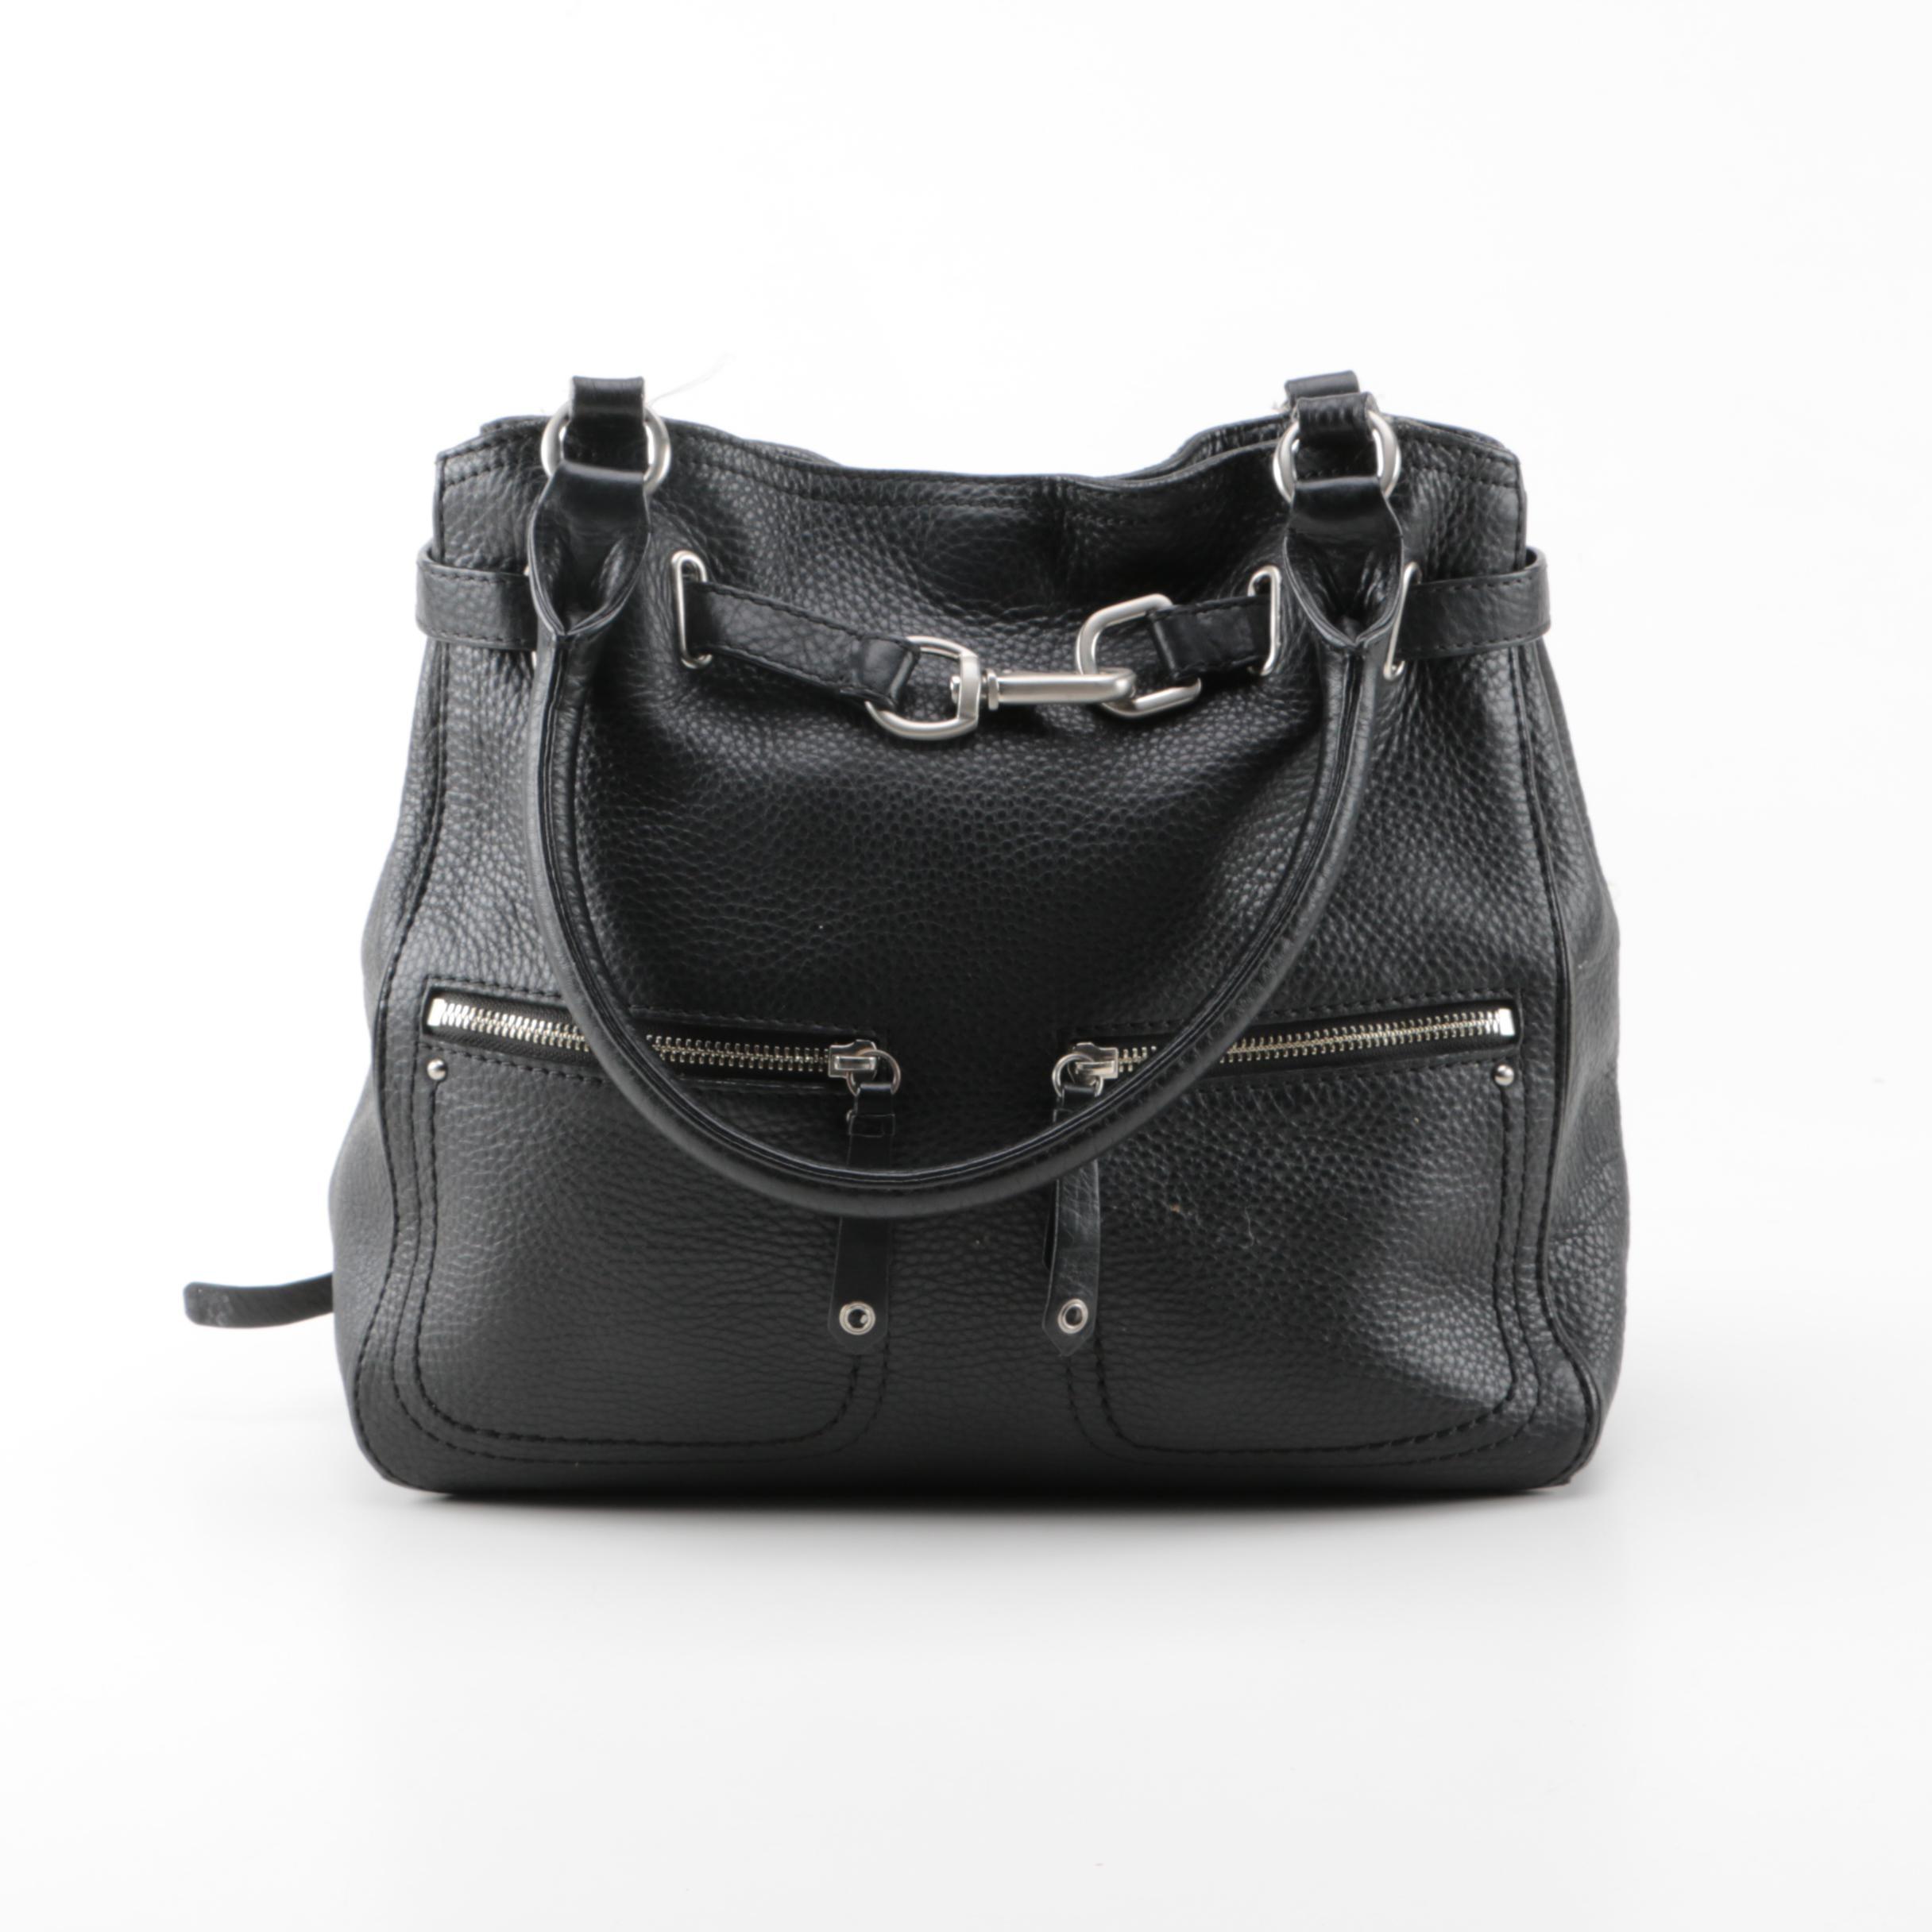 Cole Haan Grained Leather Handbag